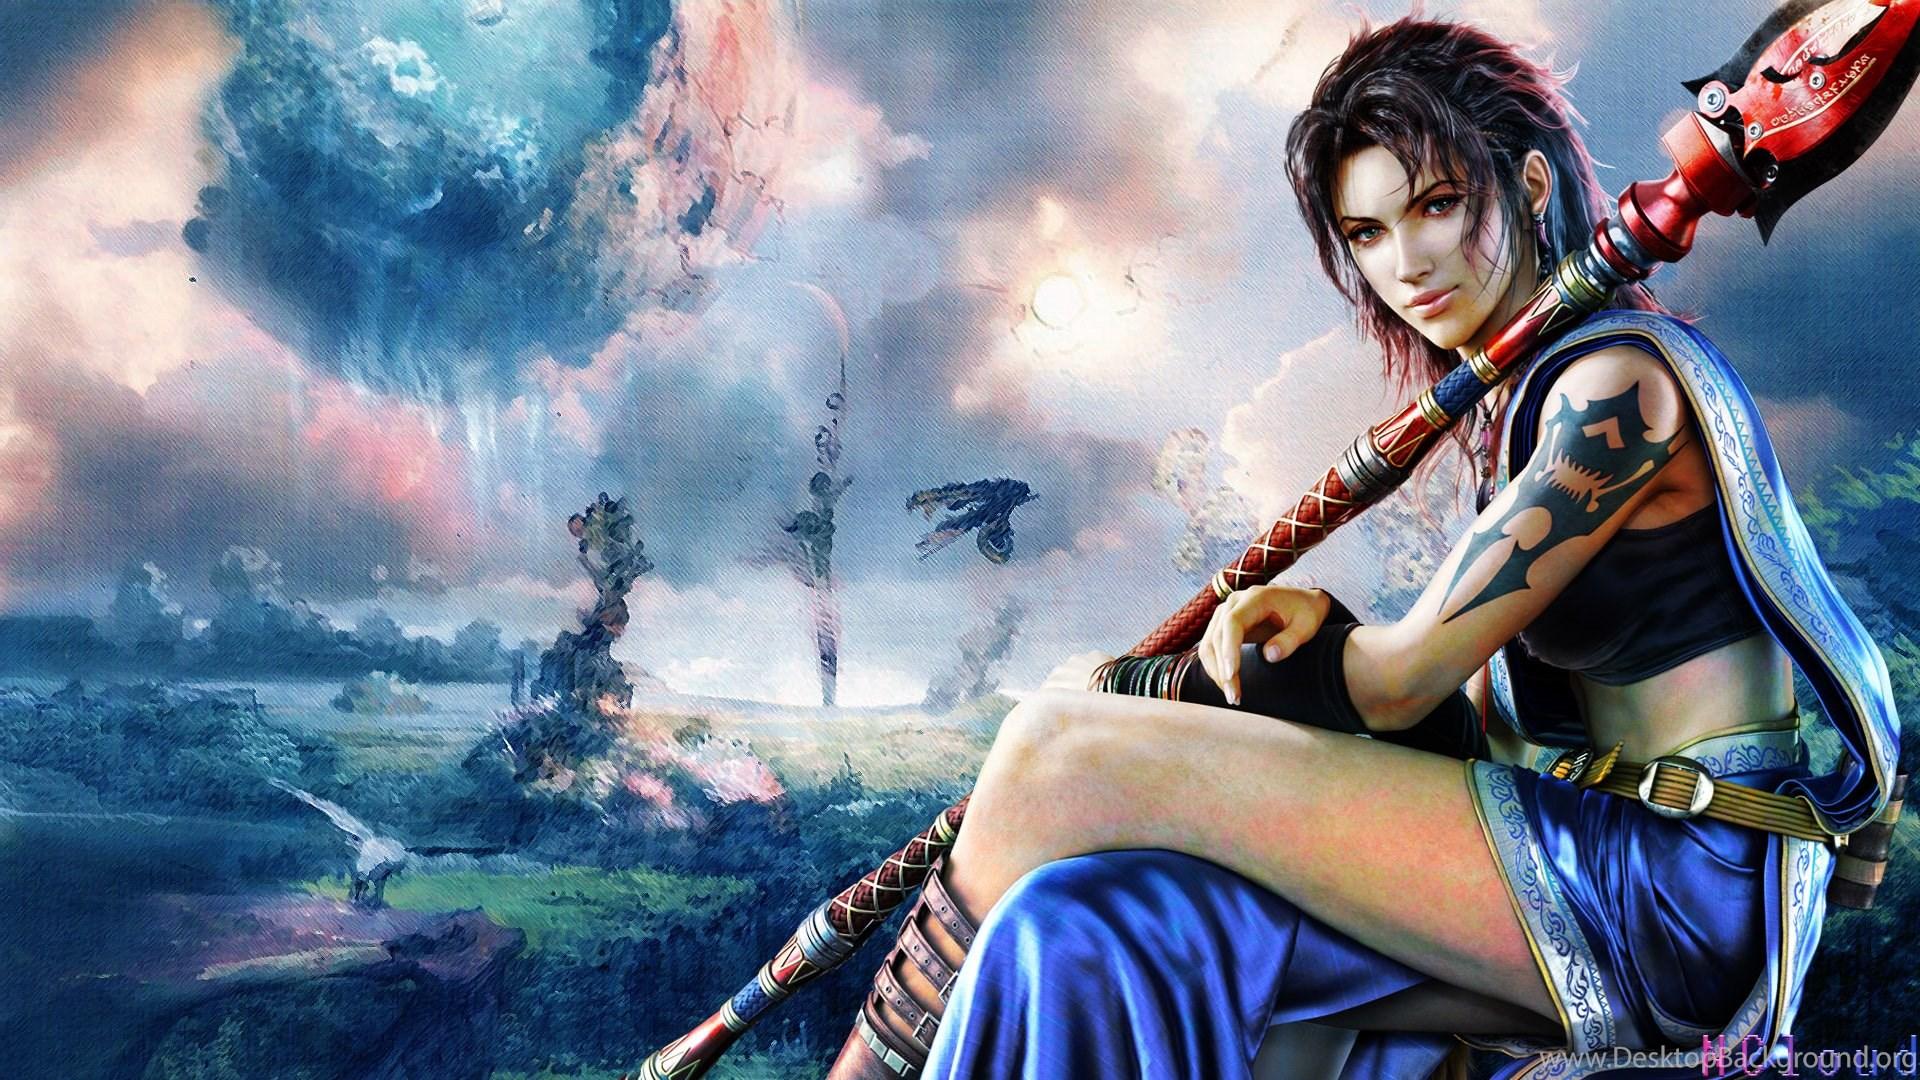 Best 12 Final Fantasy Wallpapers Desktop Background